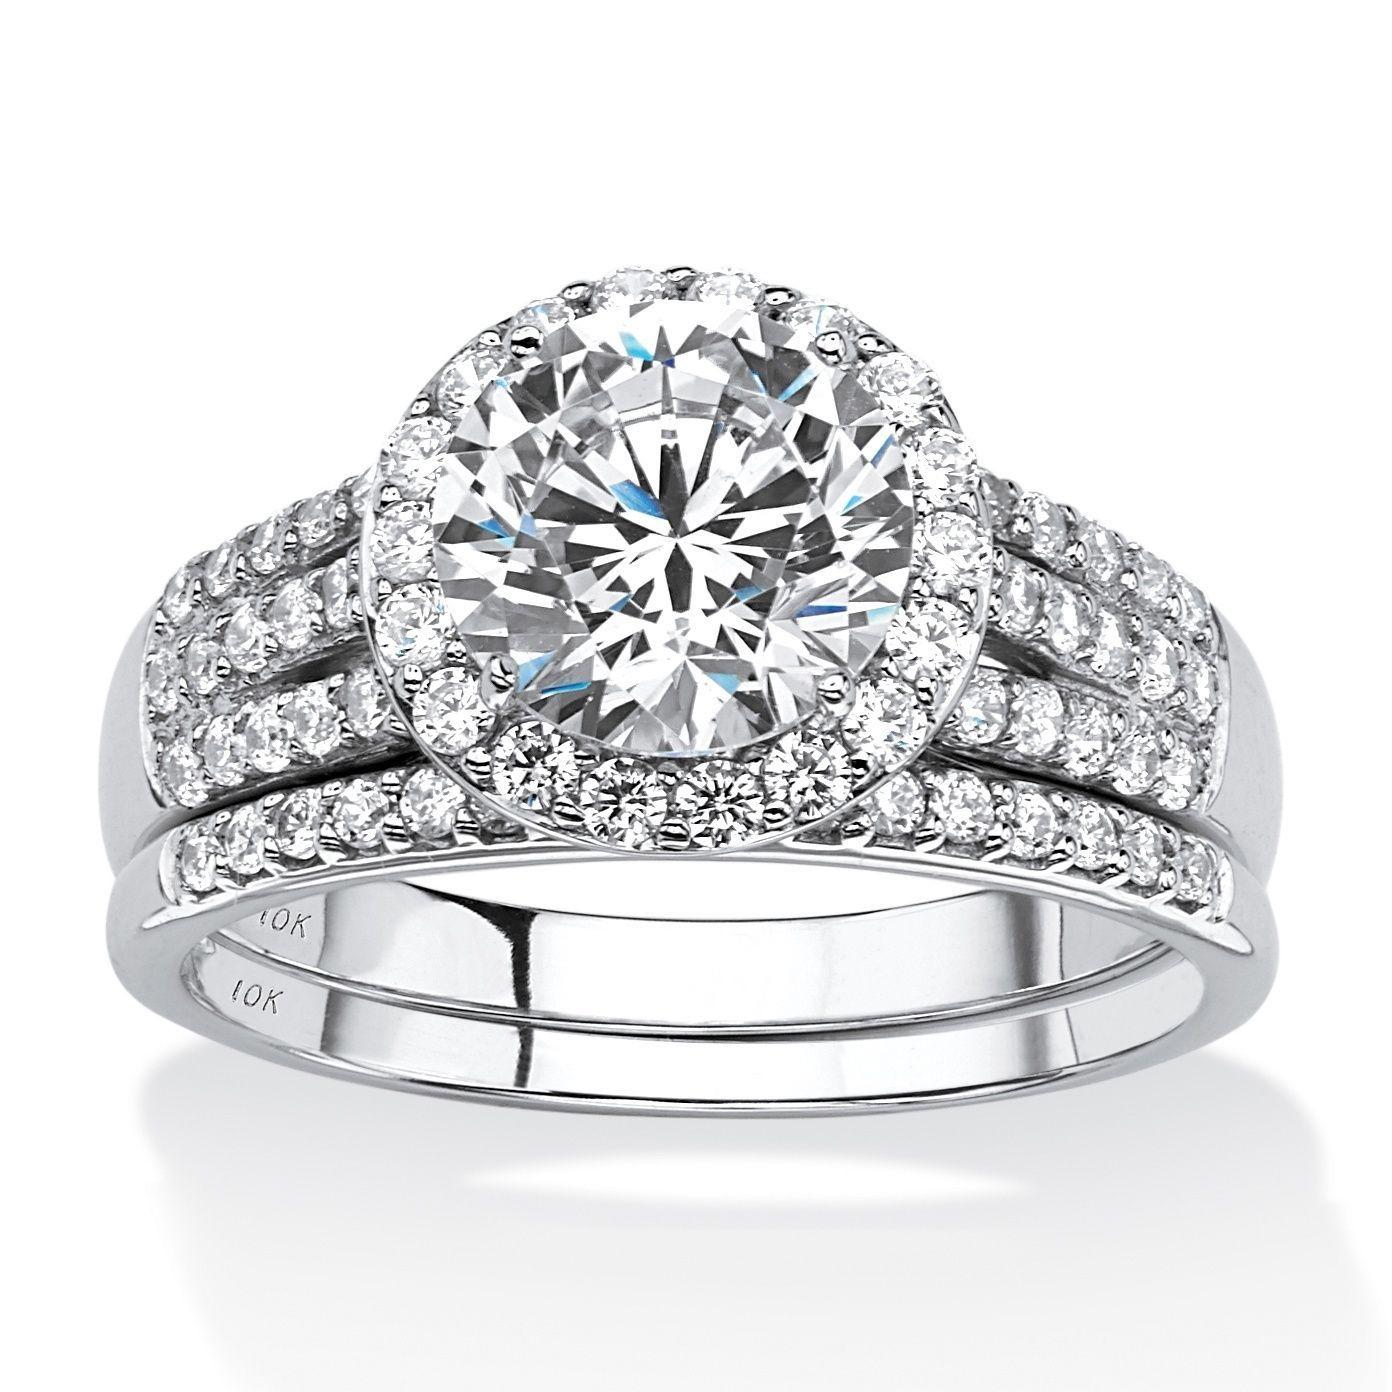 Round cubic zirconia halo bridal set 10k white gold jewelry